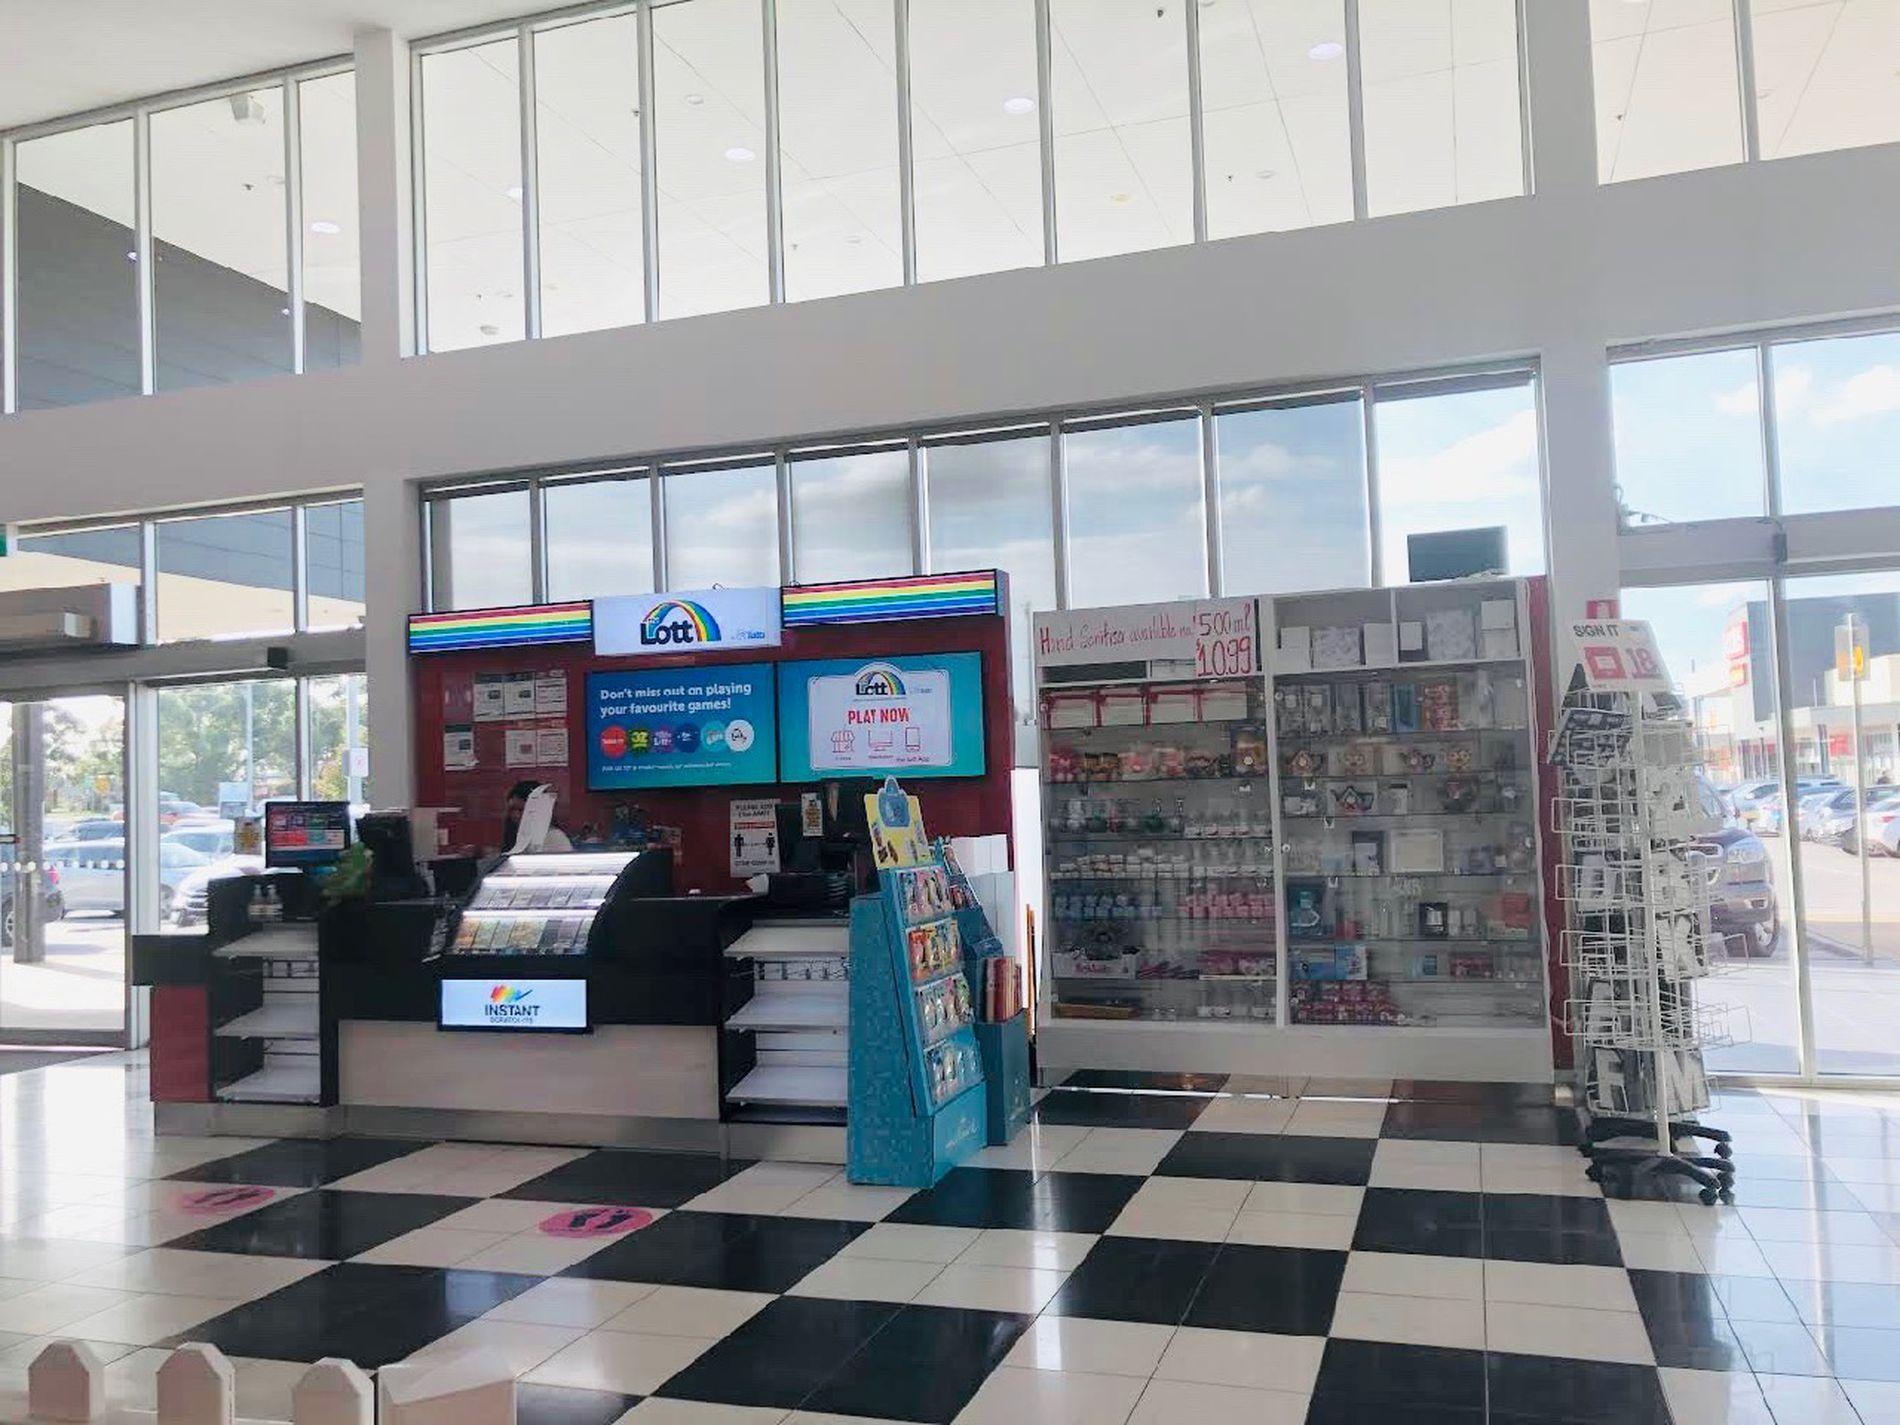 Lotto Kiosk Business For Sale Mornington Peninsula